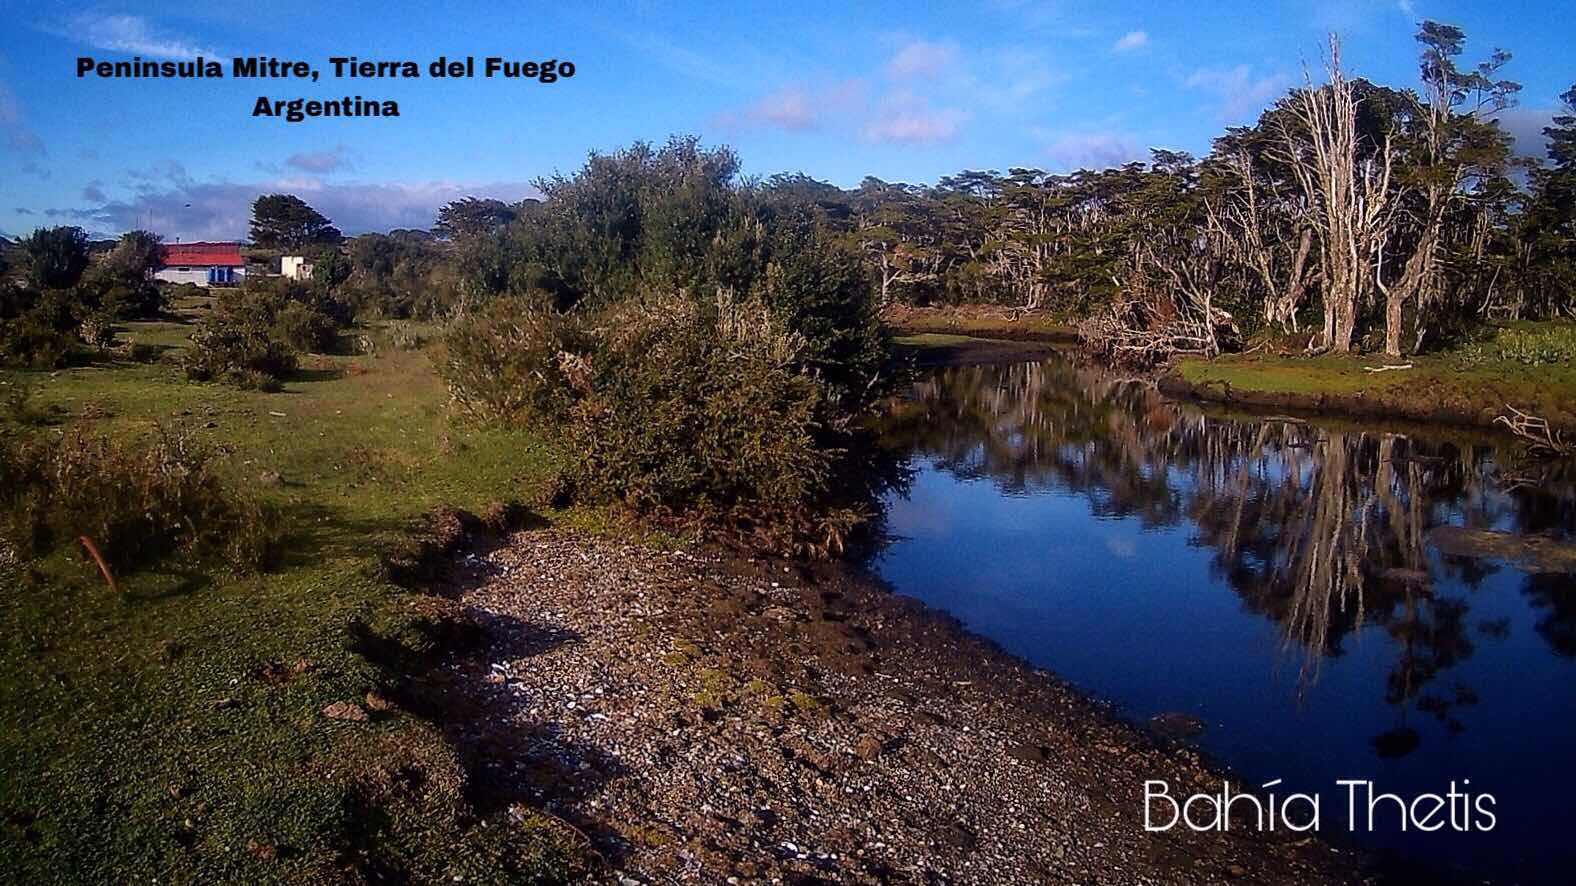 Bahía Thetis, Peninsula Mitre